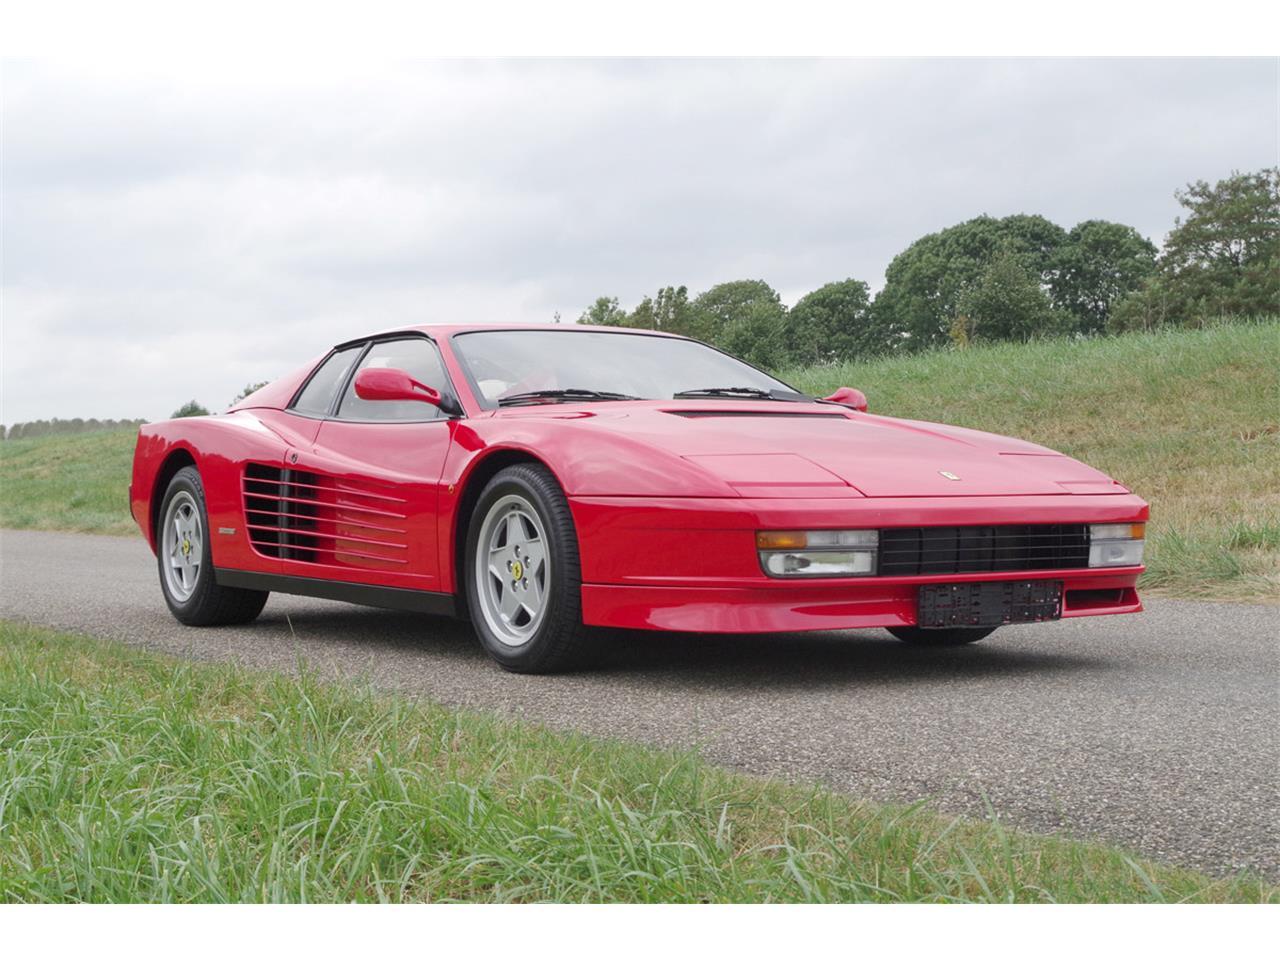 1989 Ferrari Testarossa For Sale Classiccarscom Cc 914472